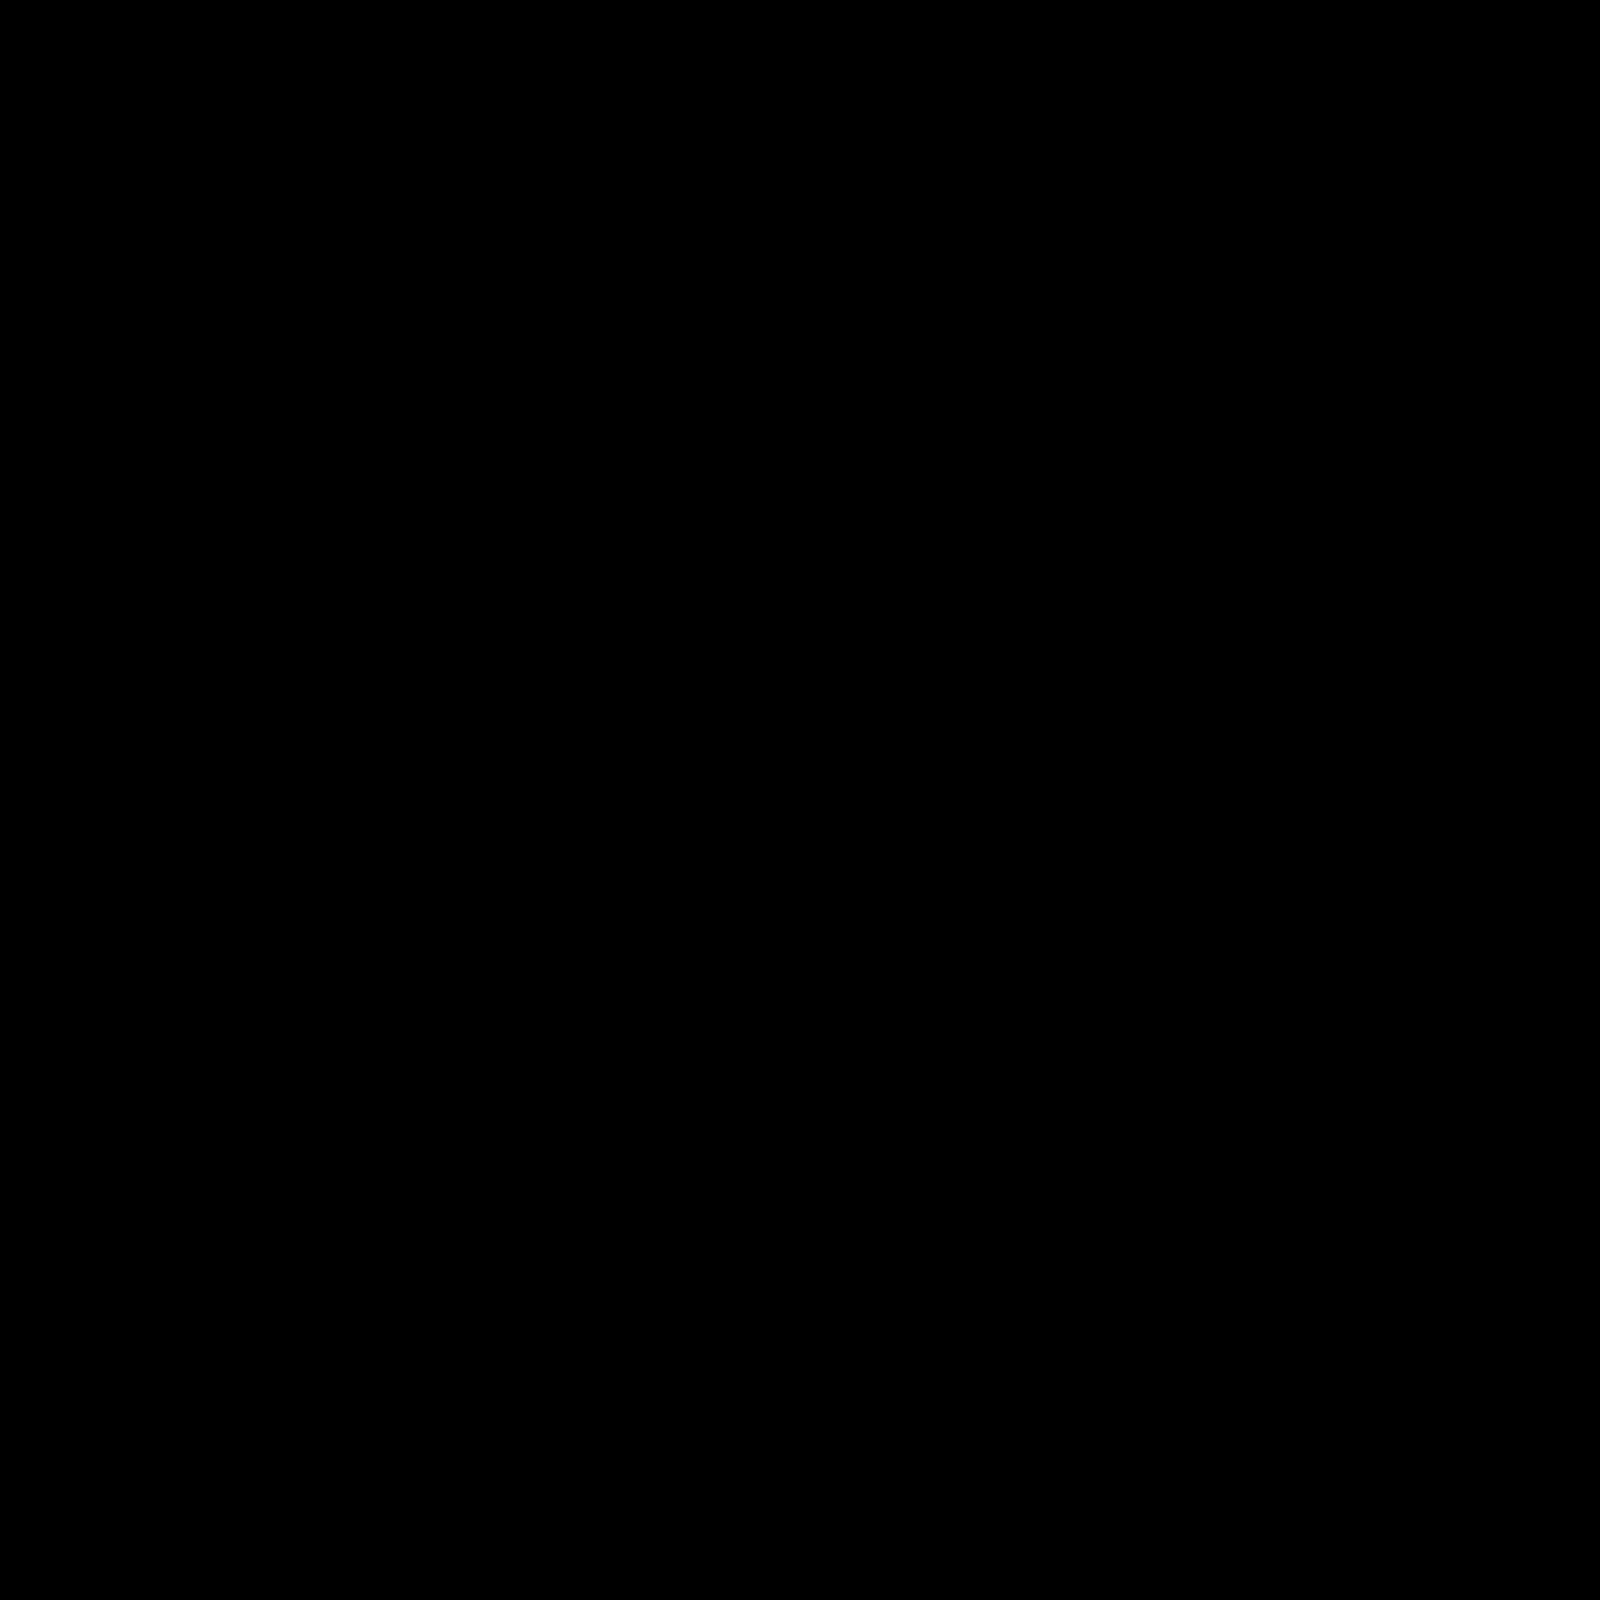 Engine clipart automotive technology. Tesla model x icon